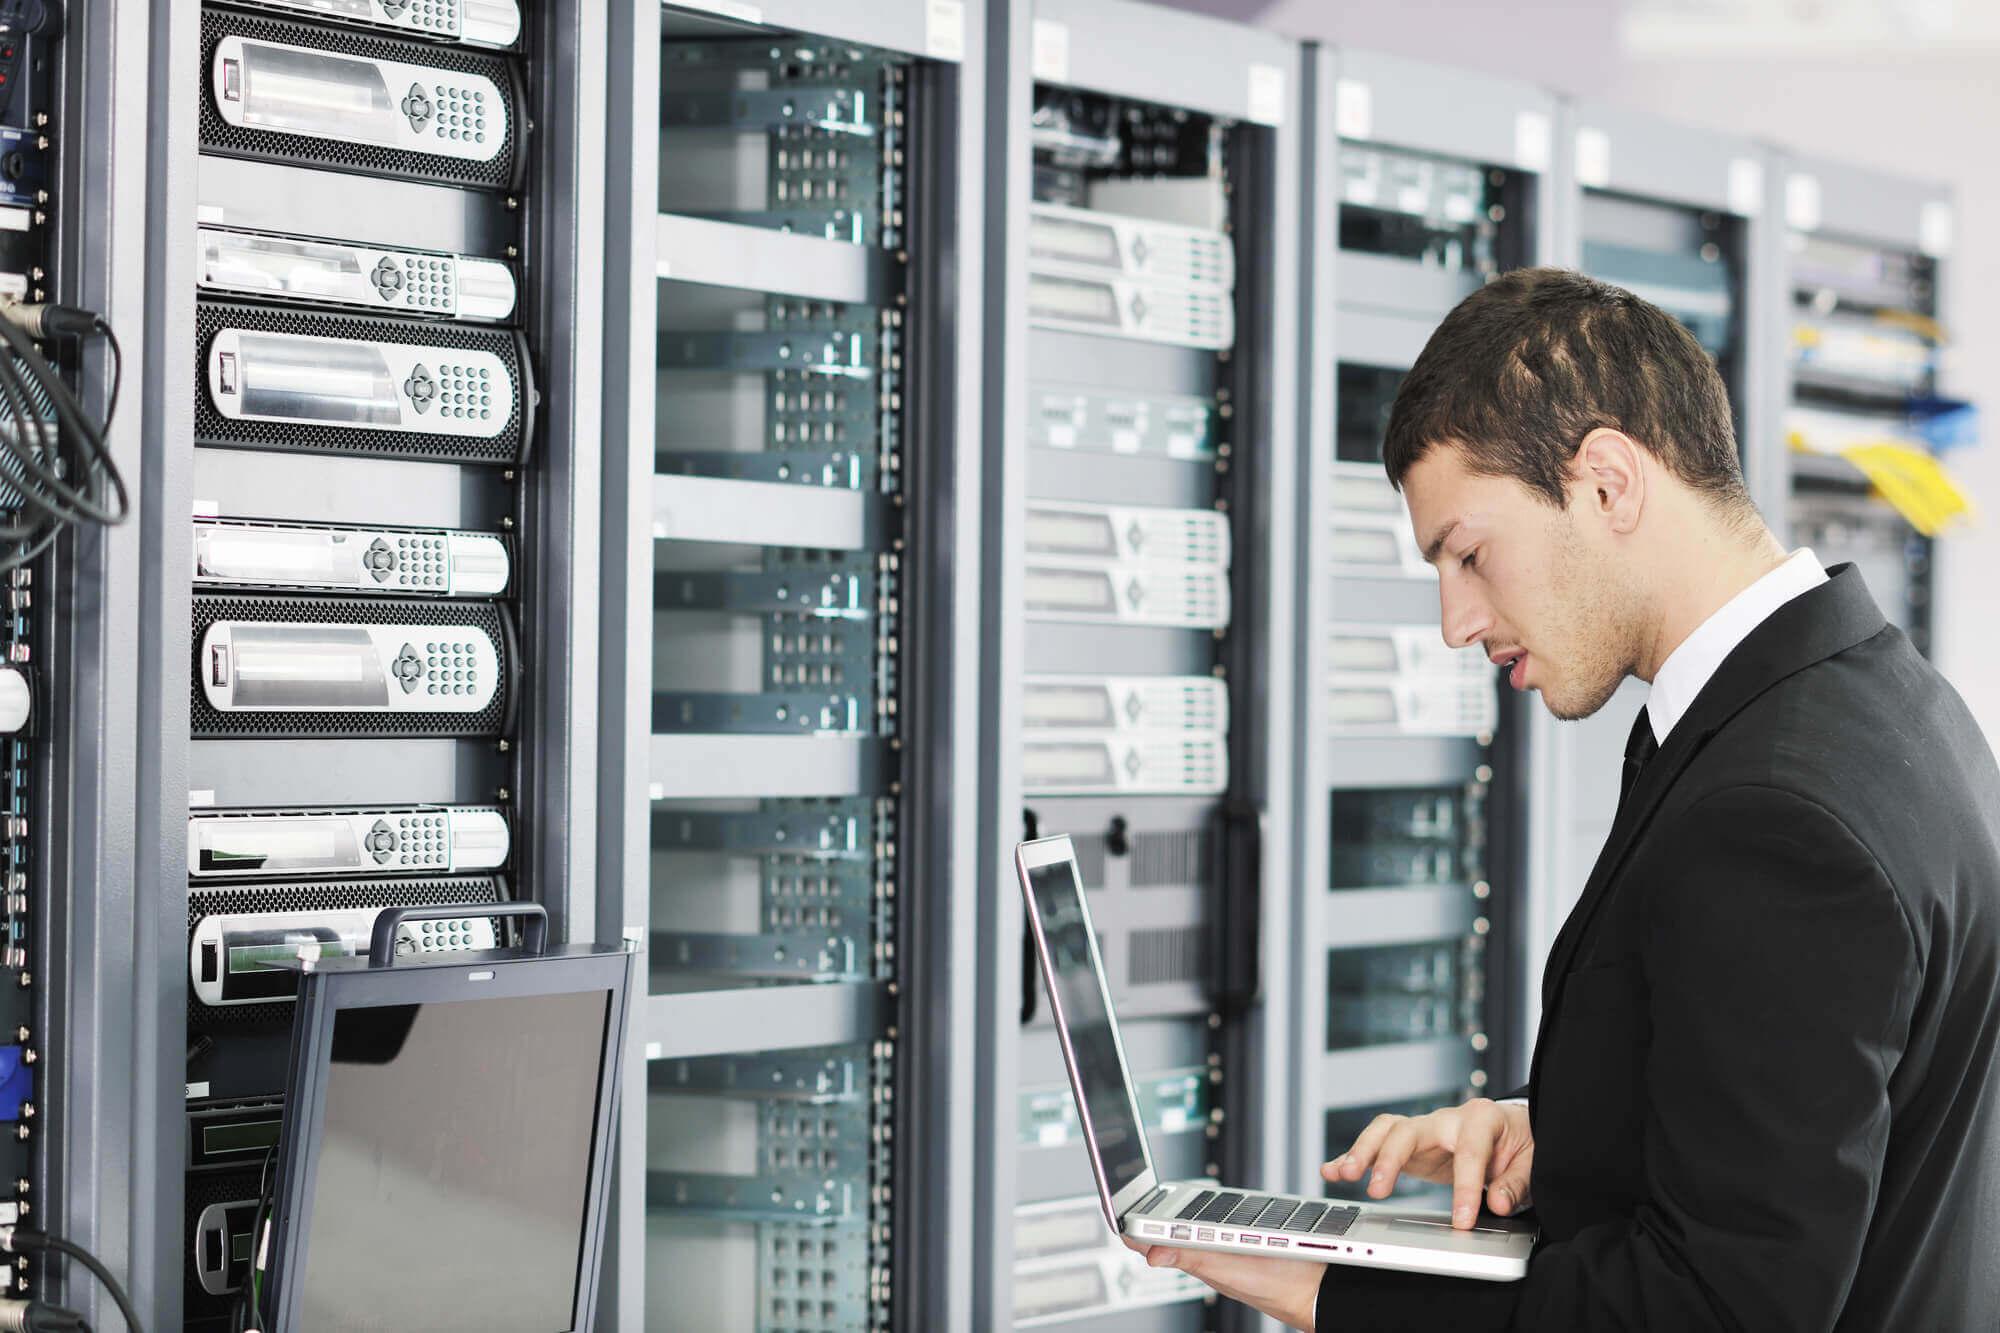 IT tech working on server racks